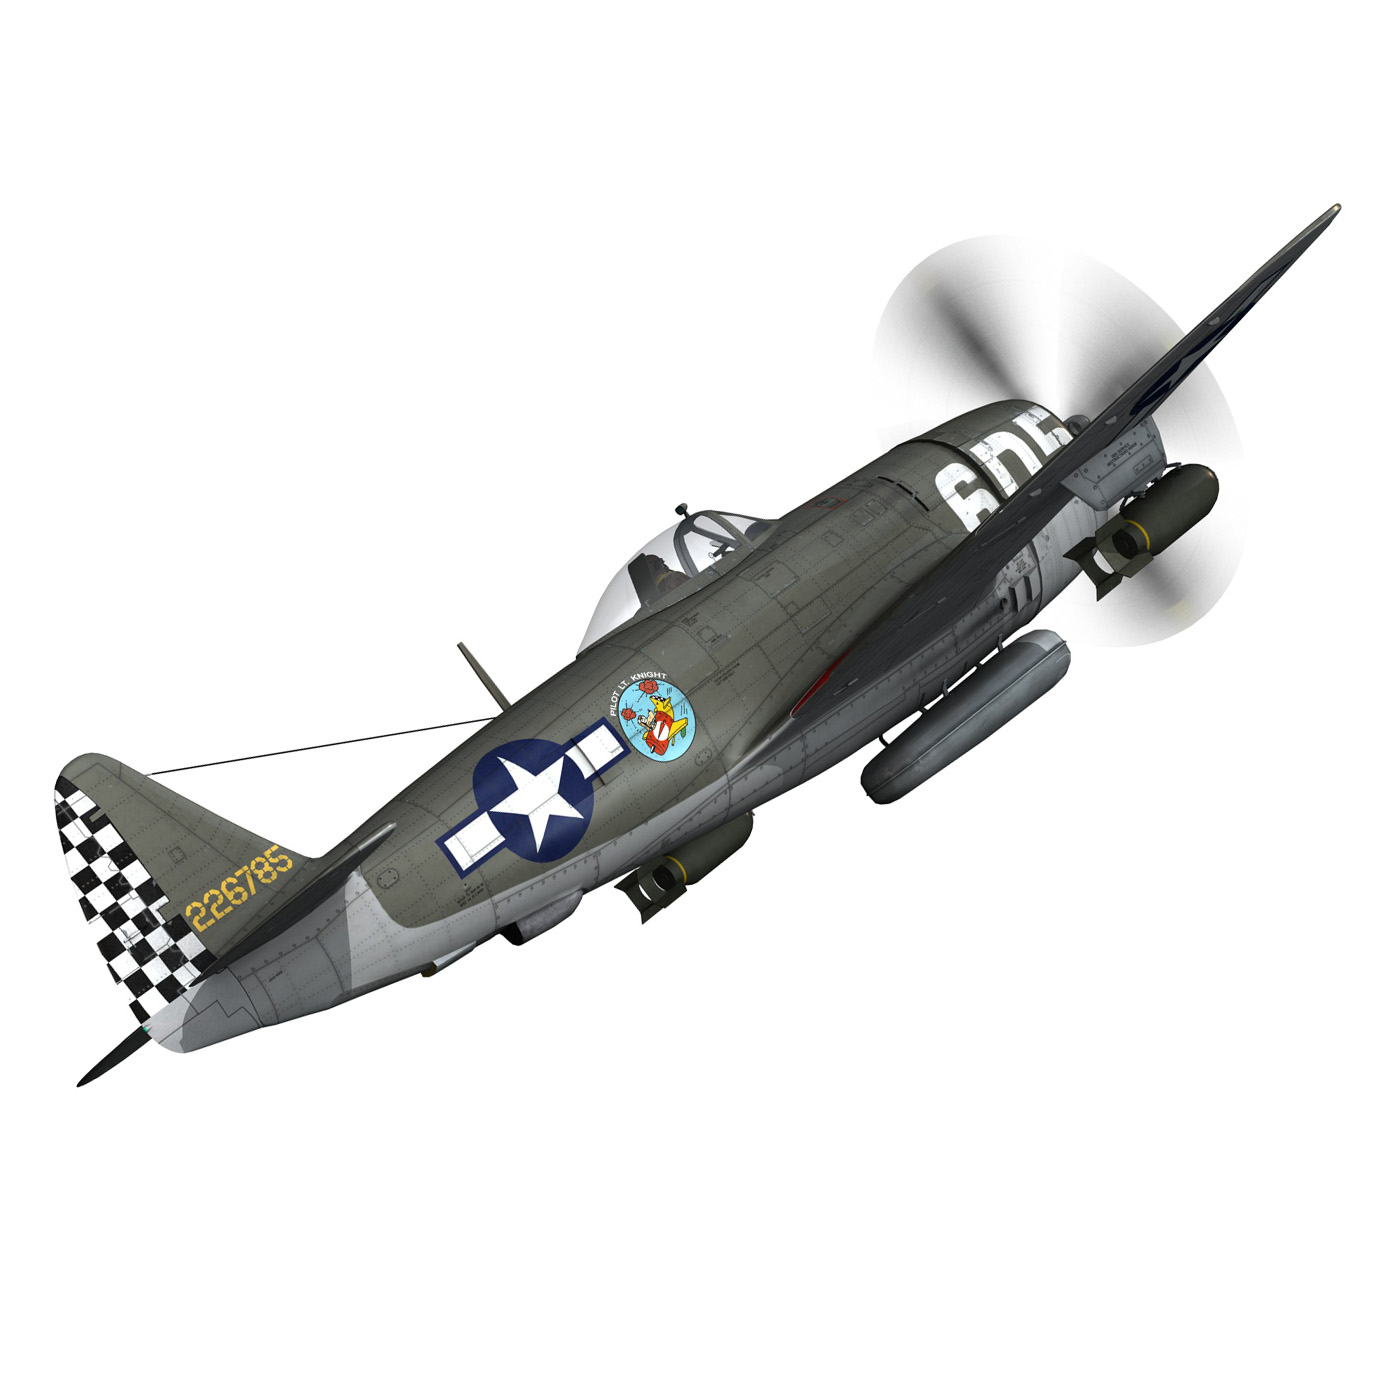 republic p-47 thunderbolt – oh johnnie 3d model fbx c4d lwo obj 274252